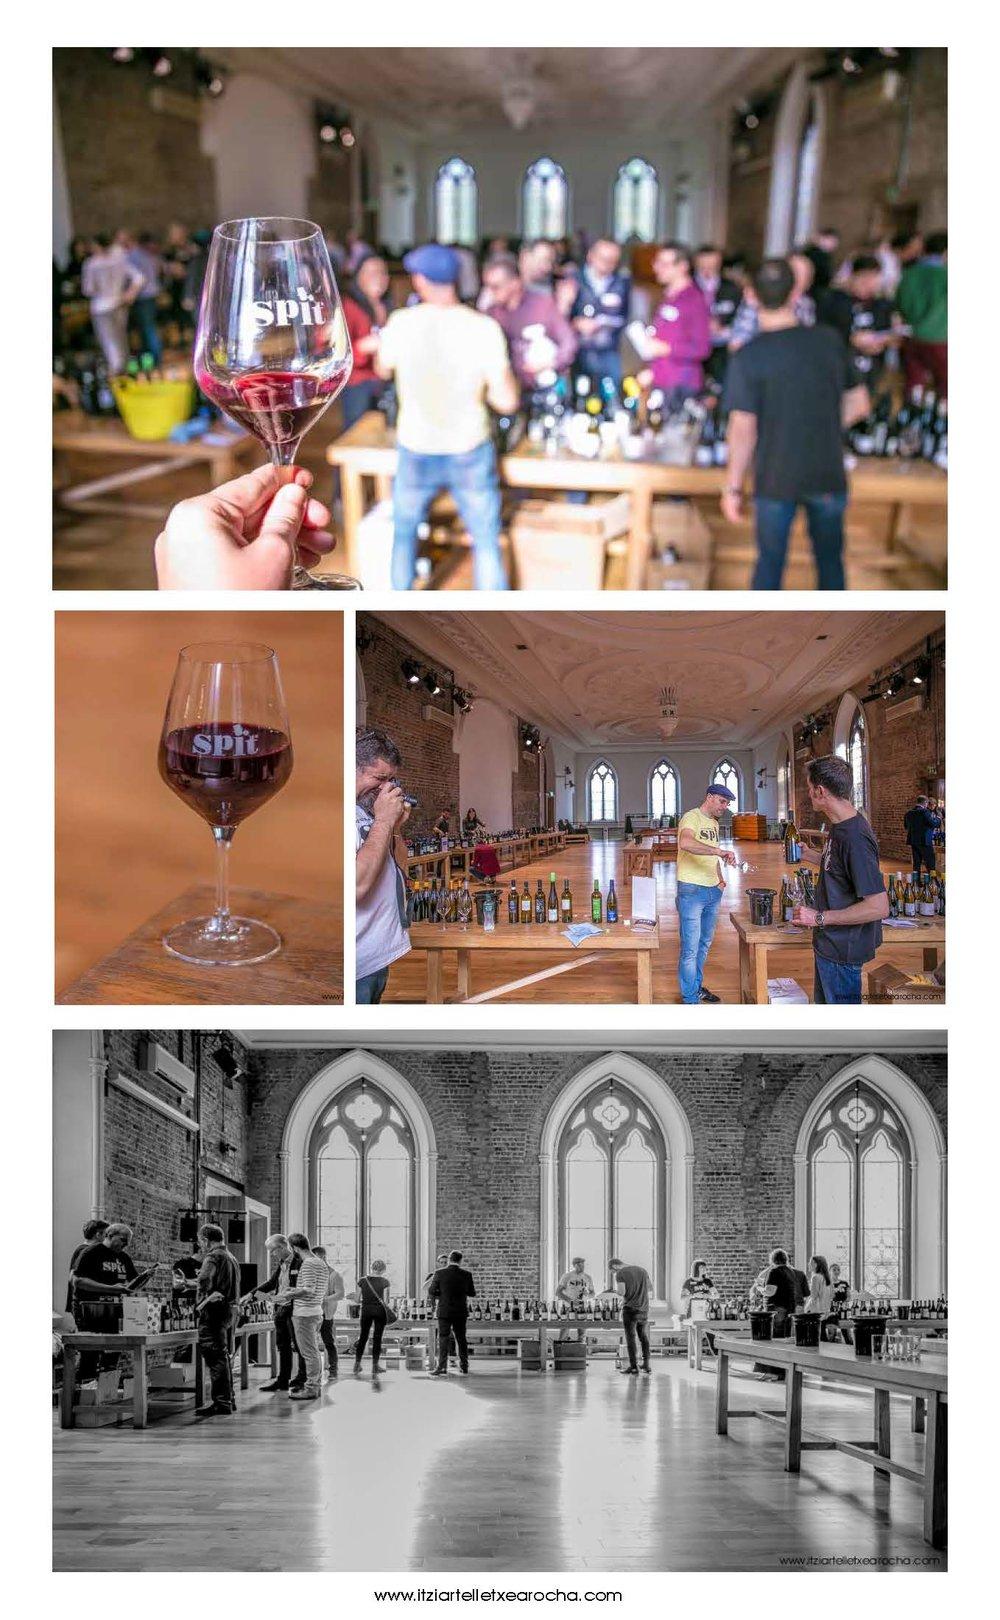 Spit Wine Festival Smock Alley 2016